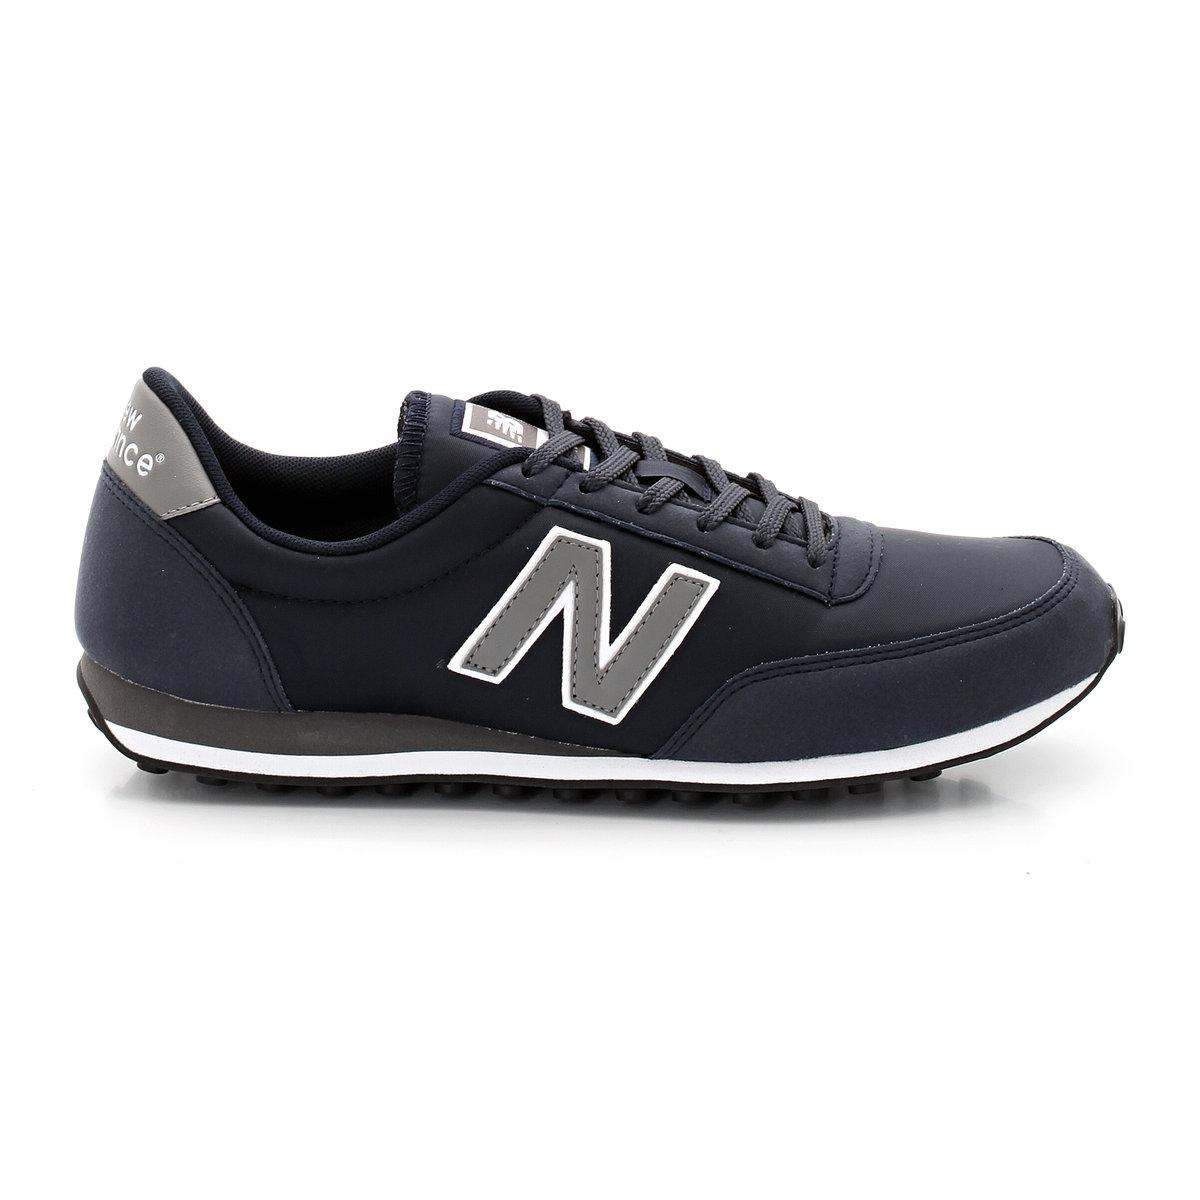 Кроссовки низкие NEW BALANCE U410CBНизкие кросовки NEW BALANCE U410CB Подкладка: текстиль Подошва: синтетика. Стелька: текстиль Верх: микрофибра + нейлон Застёжка: шнуровка<br><br>Цвет: темно-синий<br>Размер: 41 1/2.40.42.43.44.45